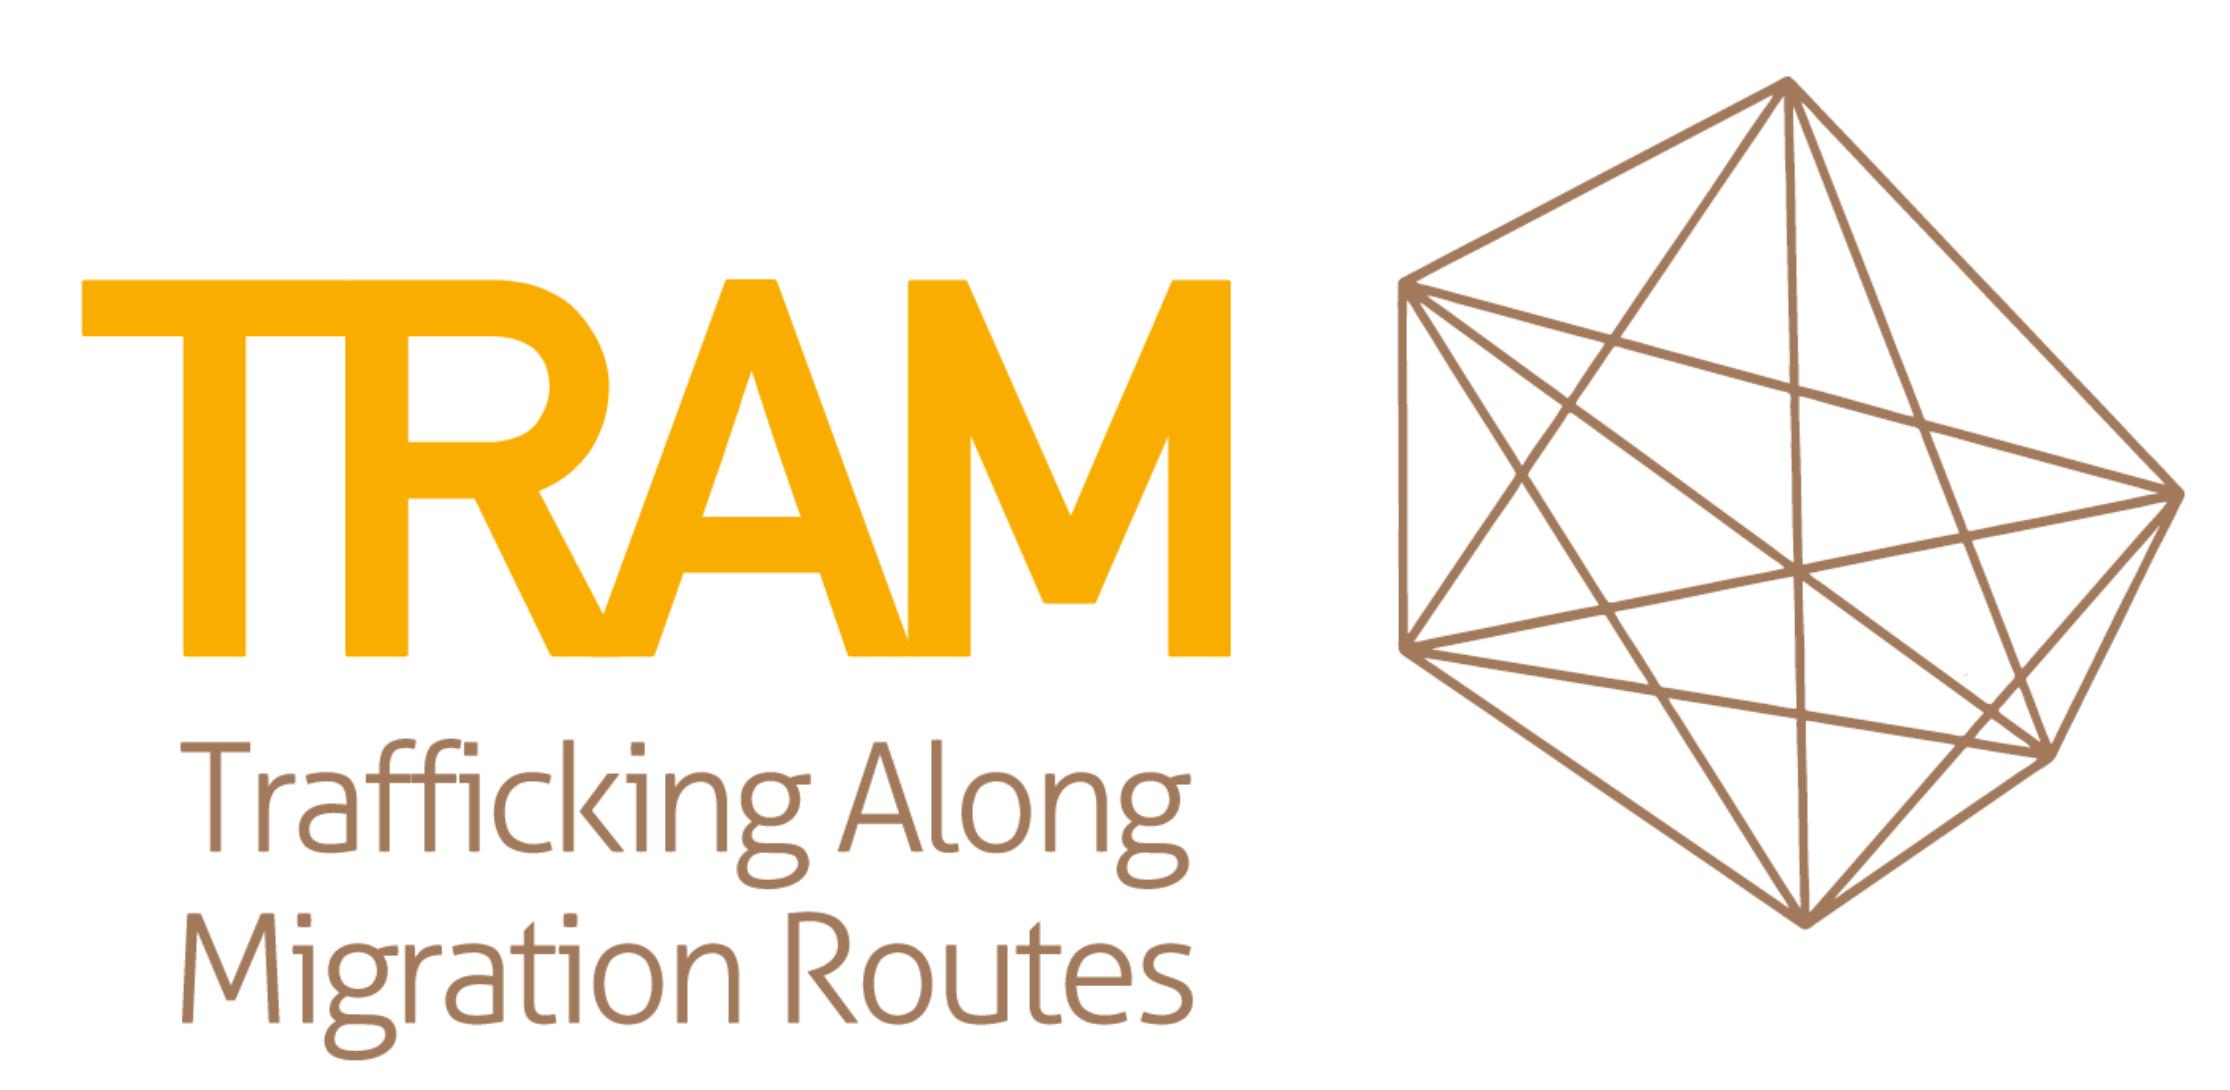 TRAM logo